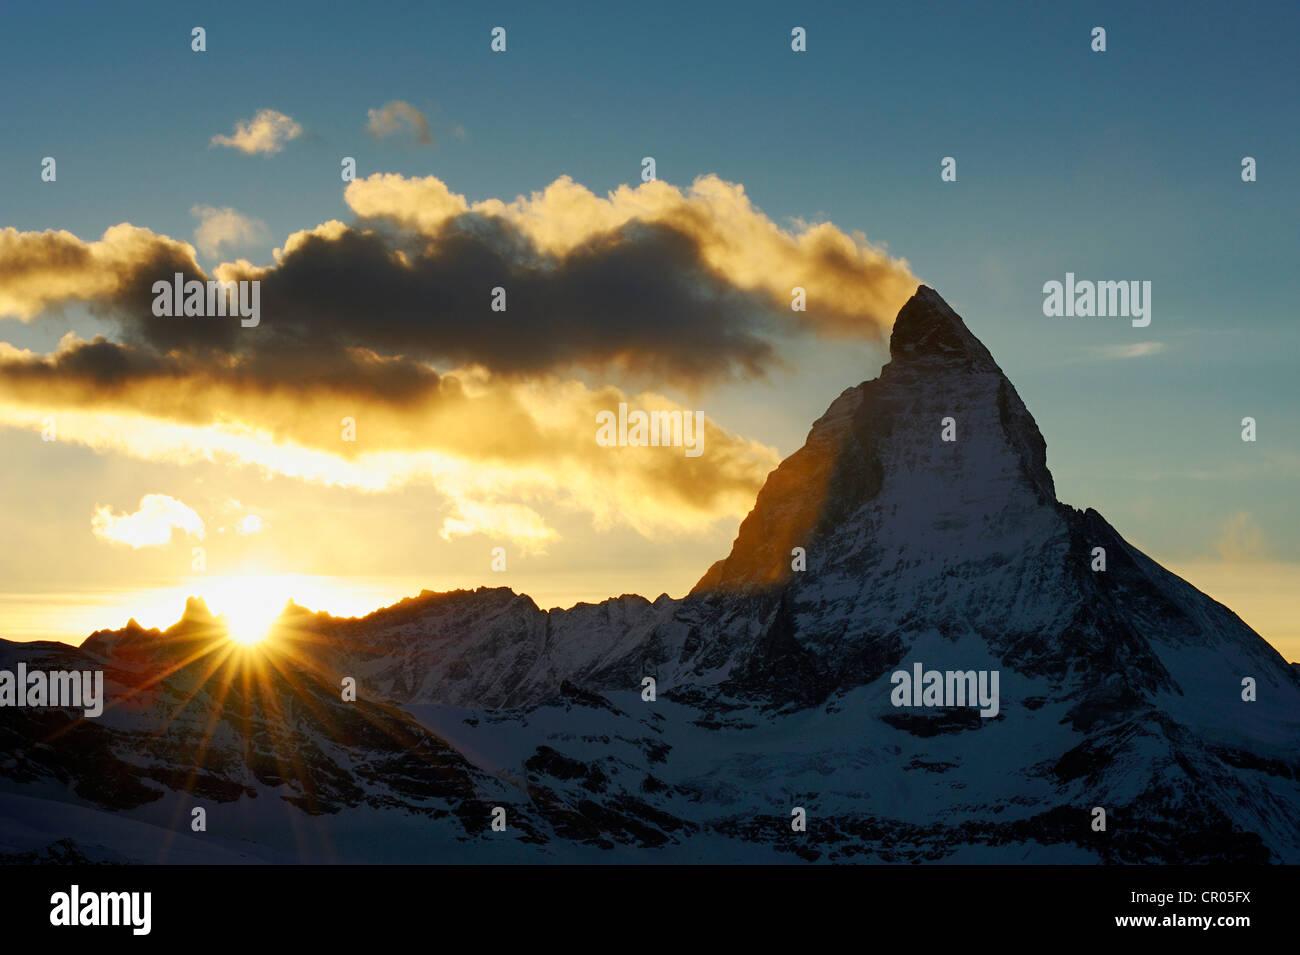 Mt. Matterhorn at sunset, Zermatt, Valais, Switzerland, Europe - Stock Image